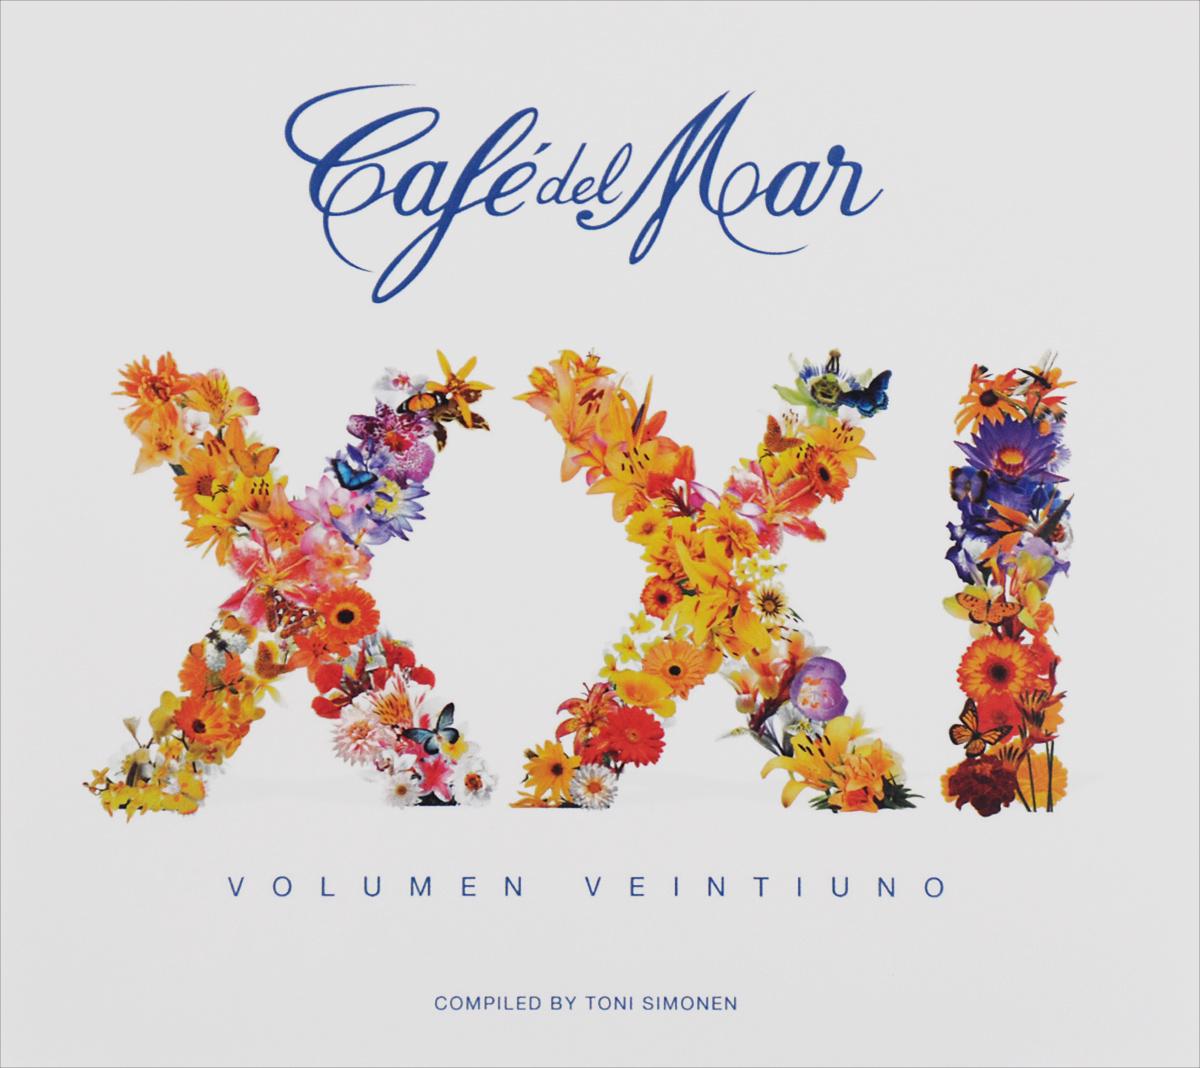 Cafe Del Mar. Volumen Veintiuno (2 CD)